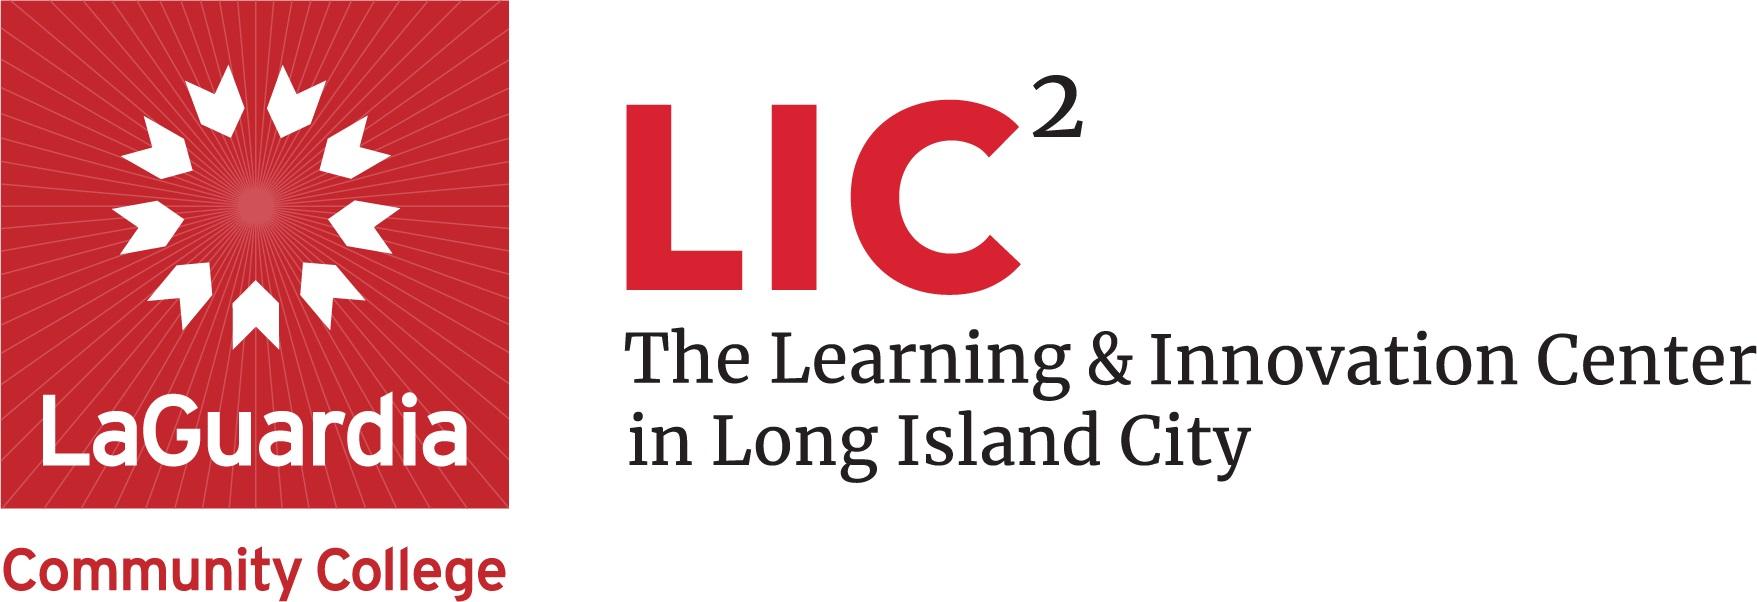 LIC2 Logo